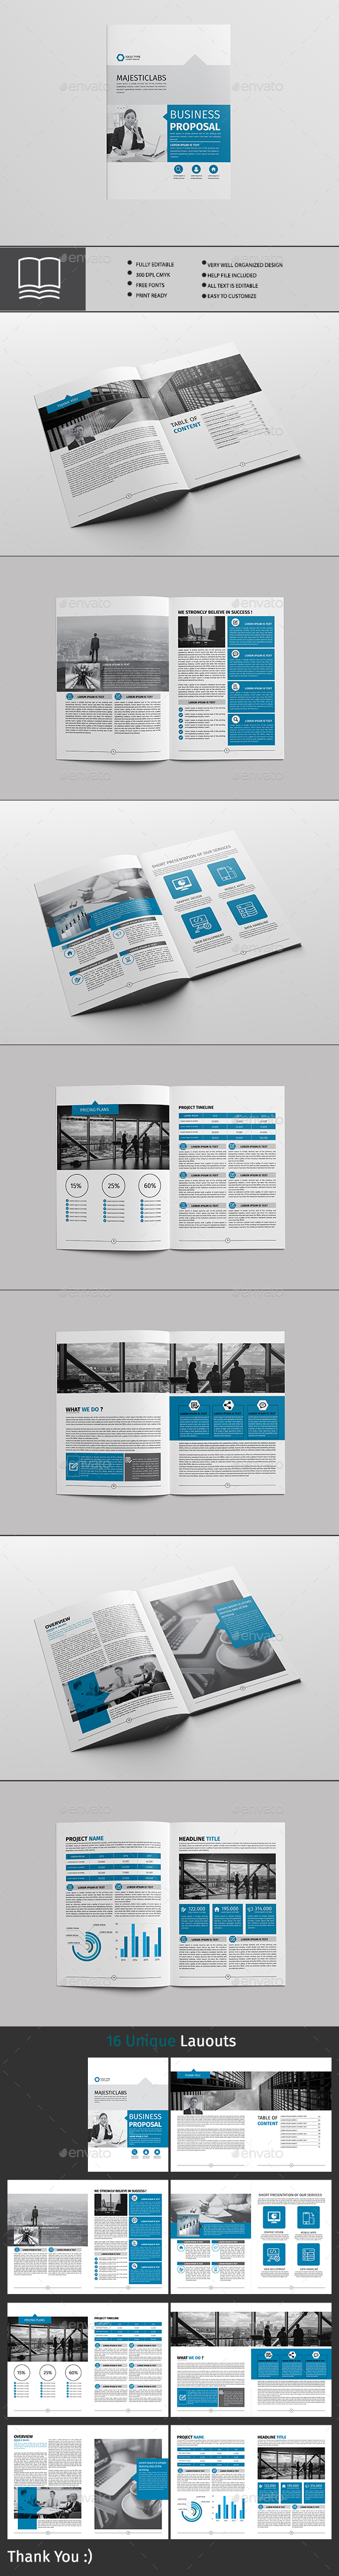 GraphicRiver Brochure 16 Page 20464531